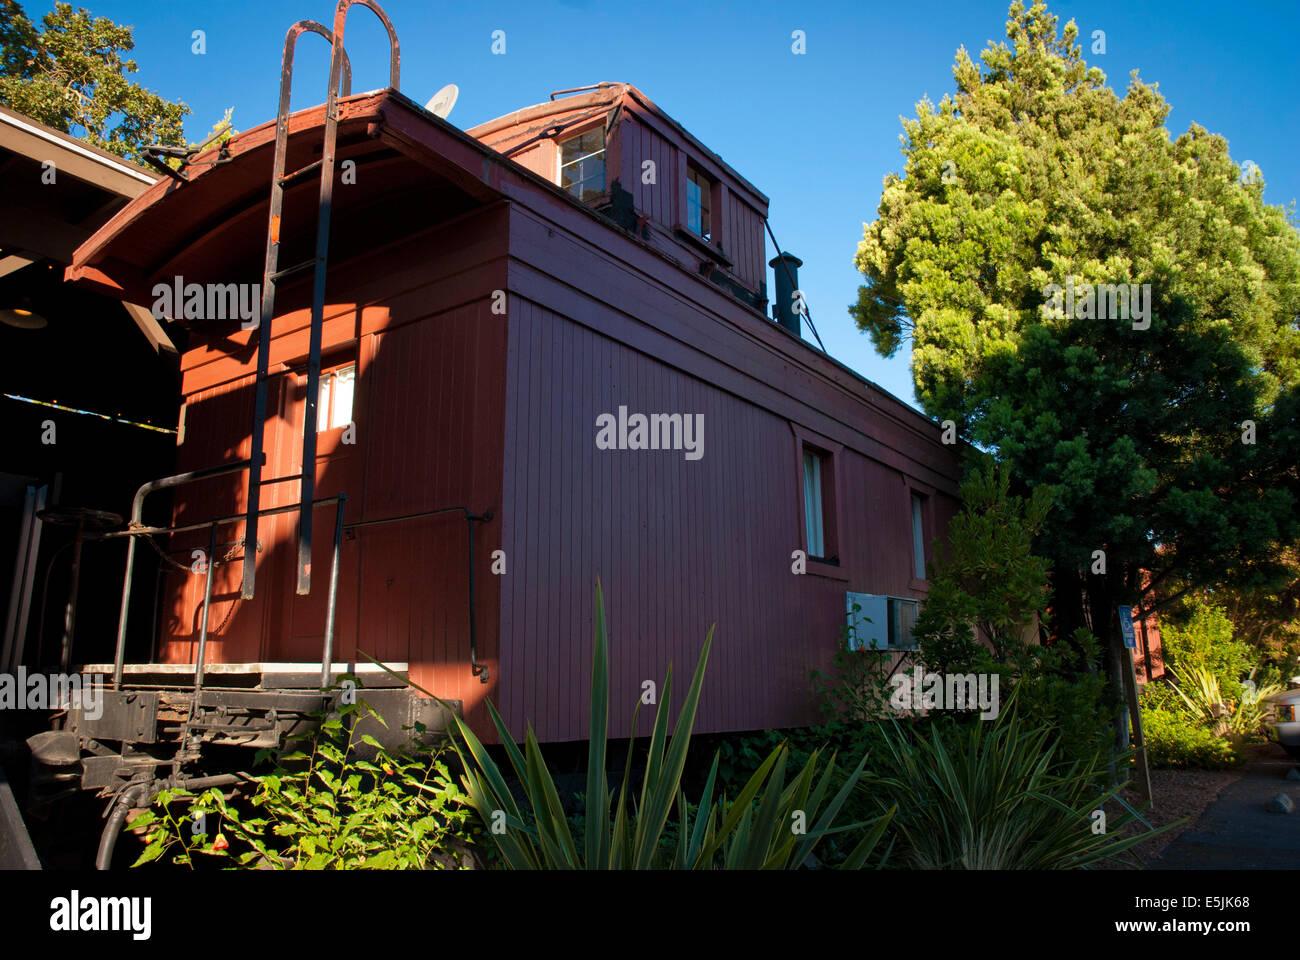 Box cars at the Railway Inn, Yountville, Napa Valley, California - Stock Image